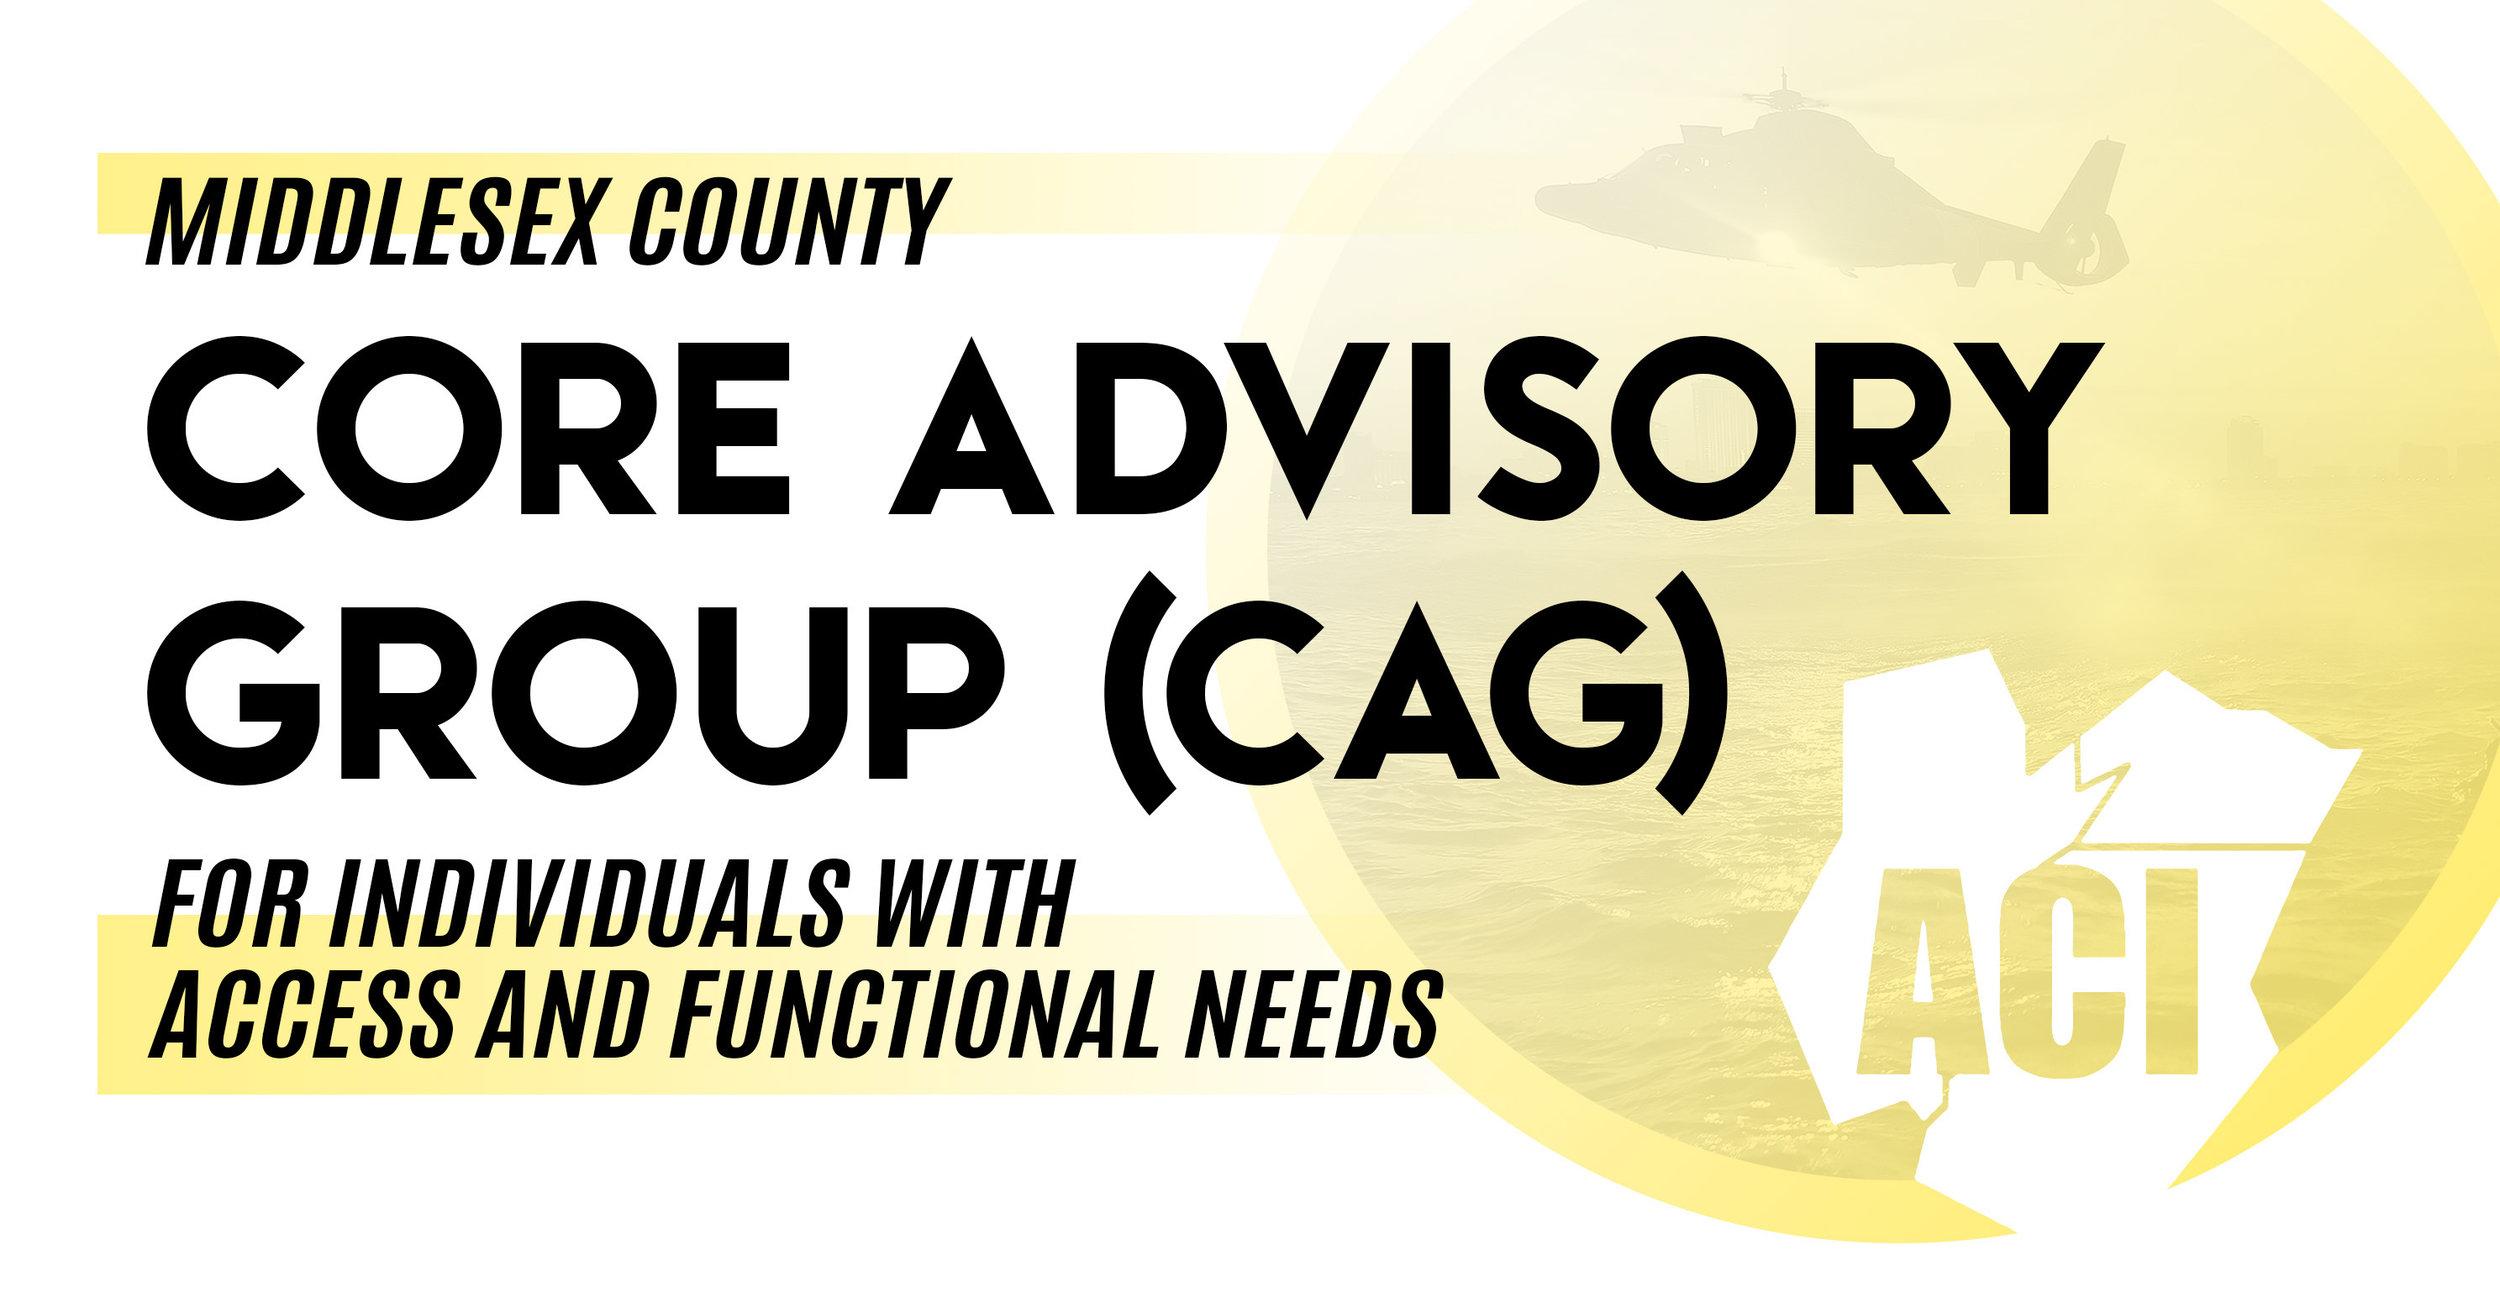 core advisory group cag meeting